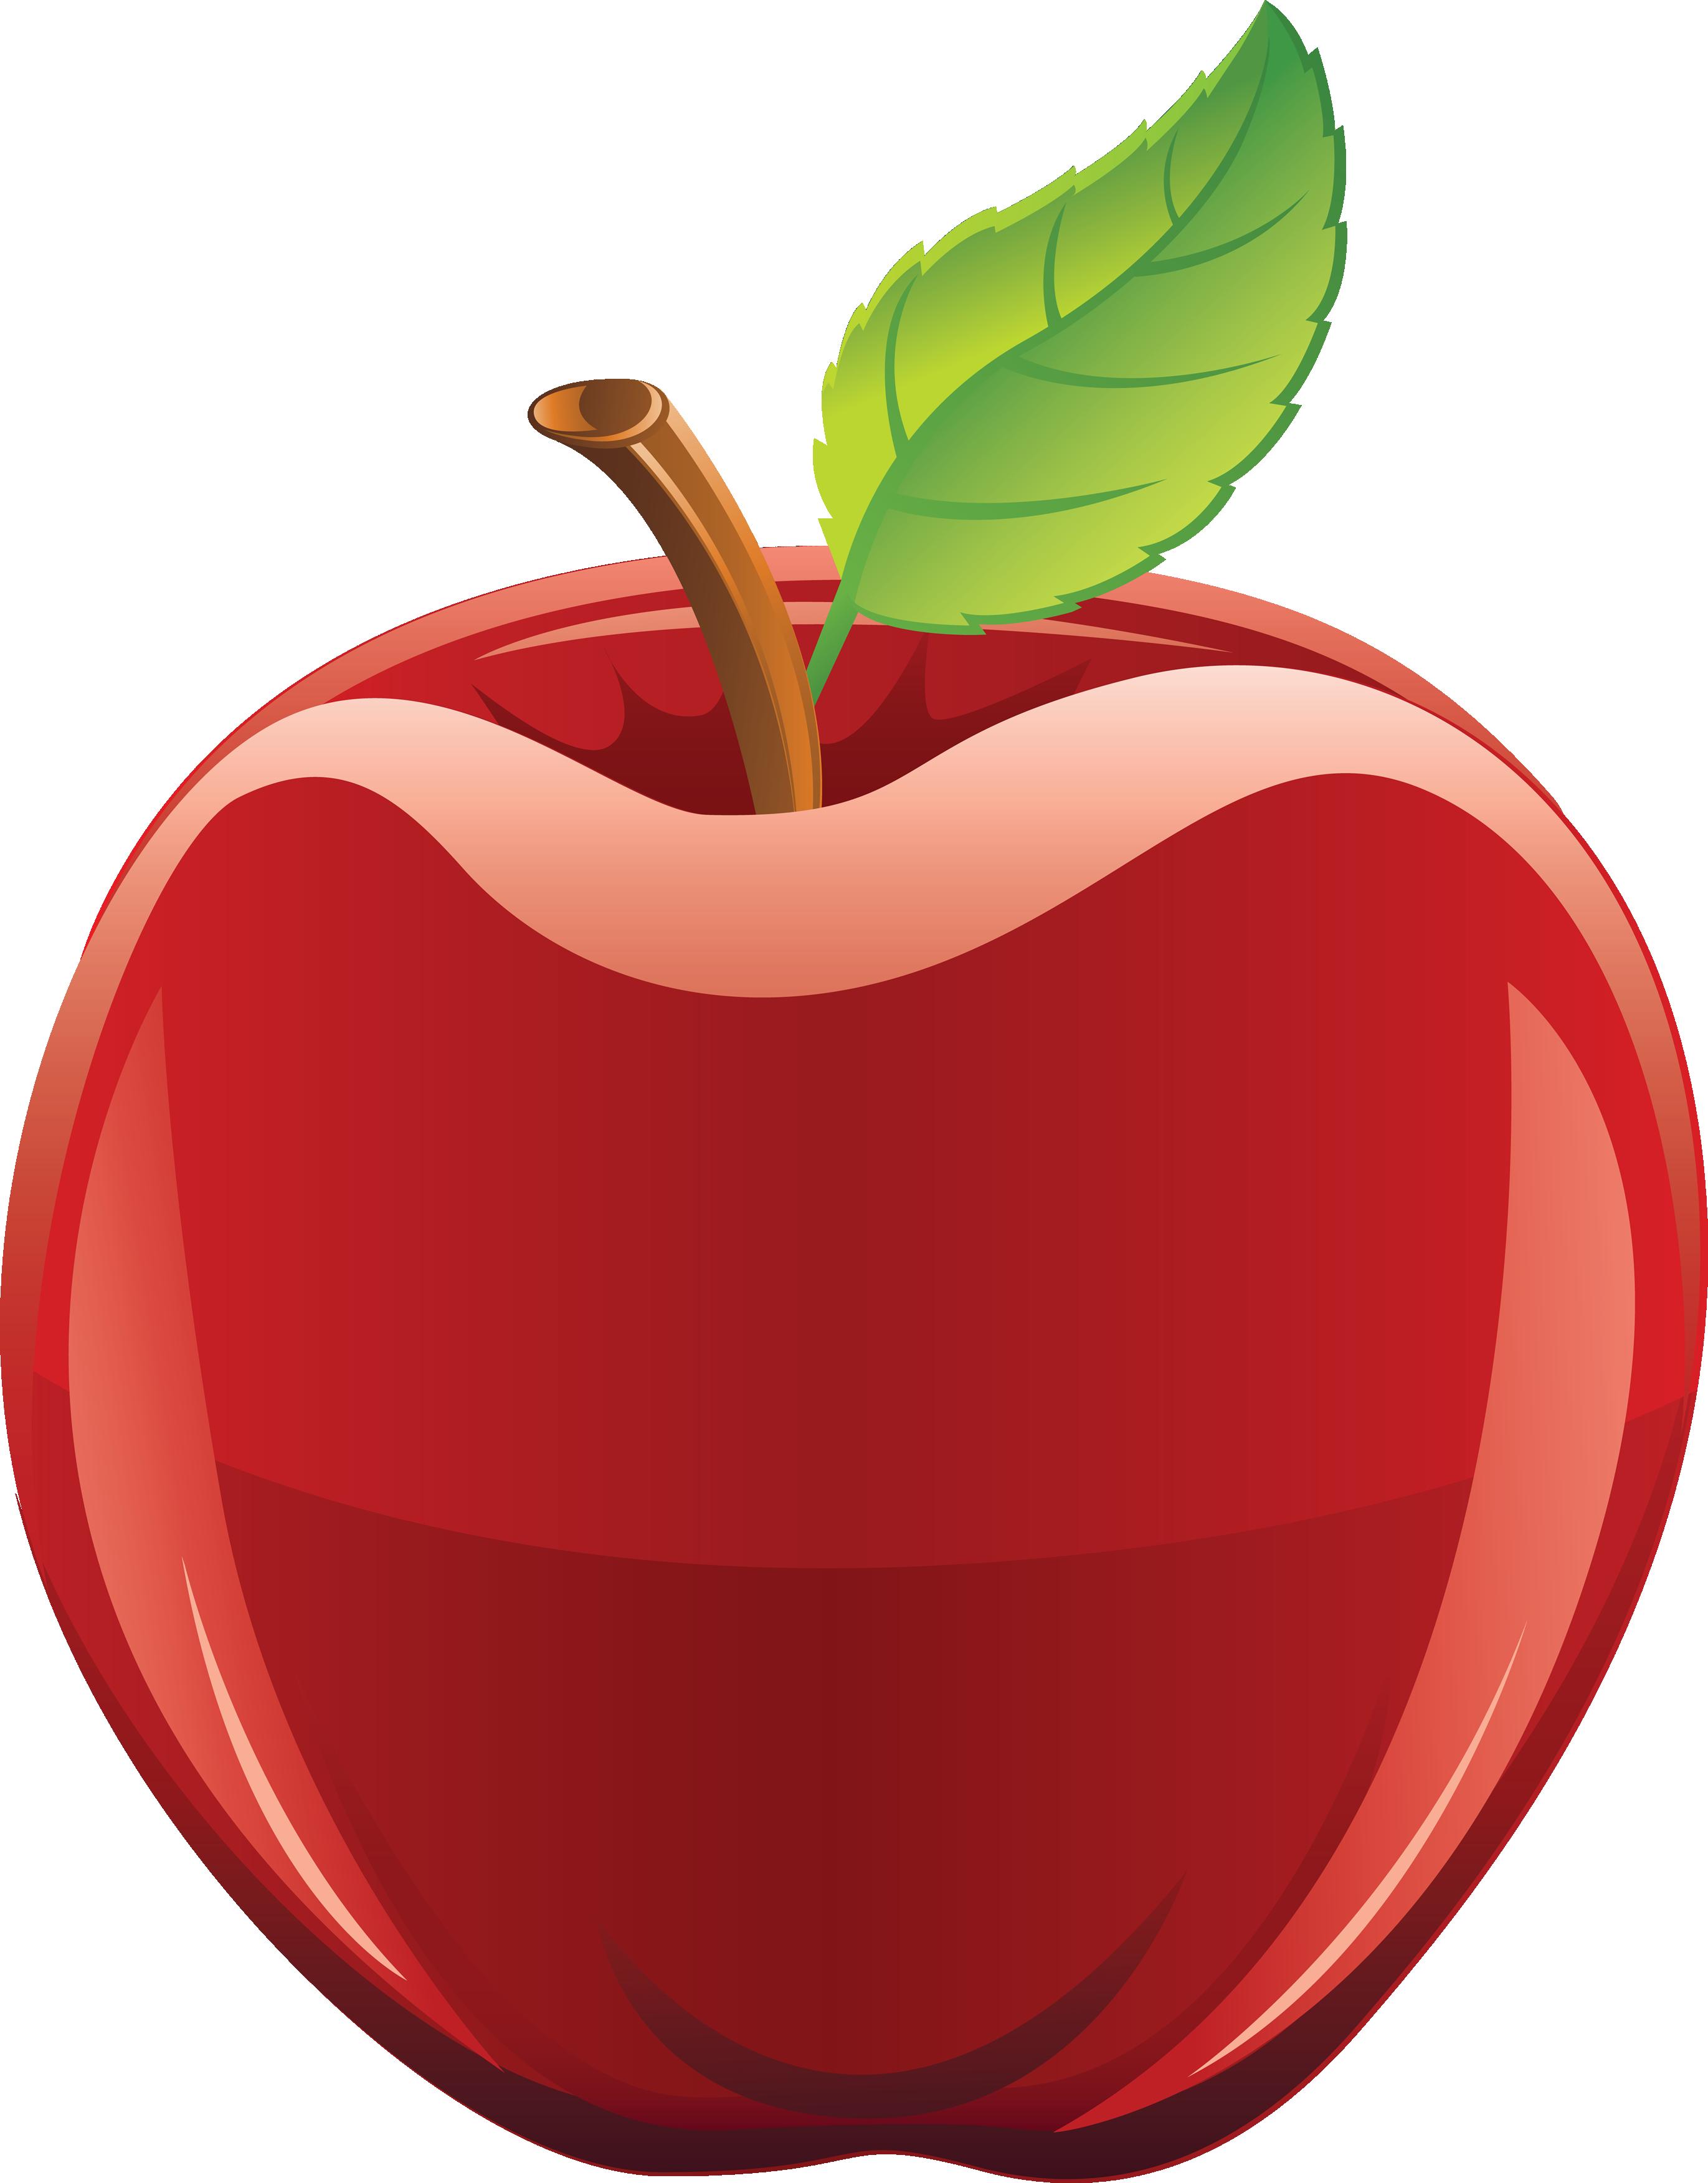 Cute apple clip art free clipart image 2 3.